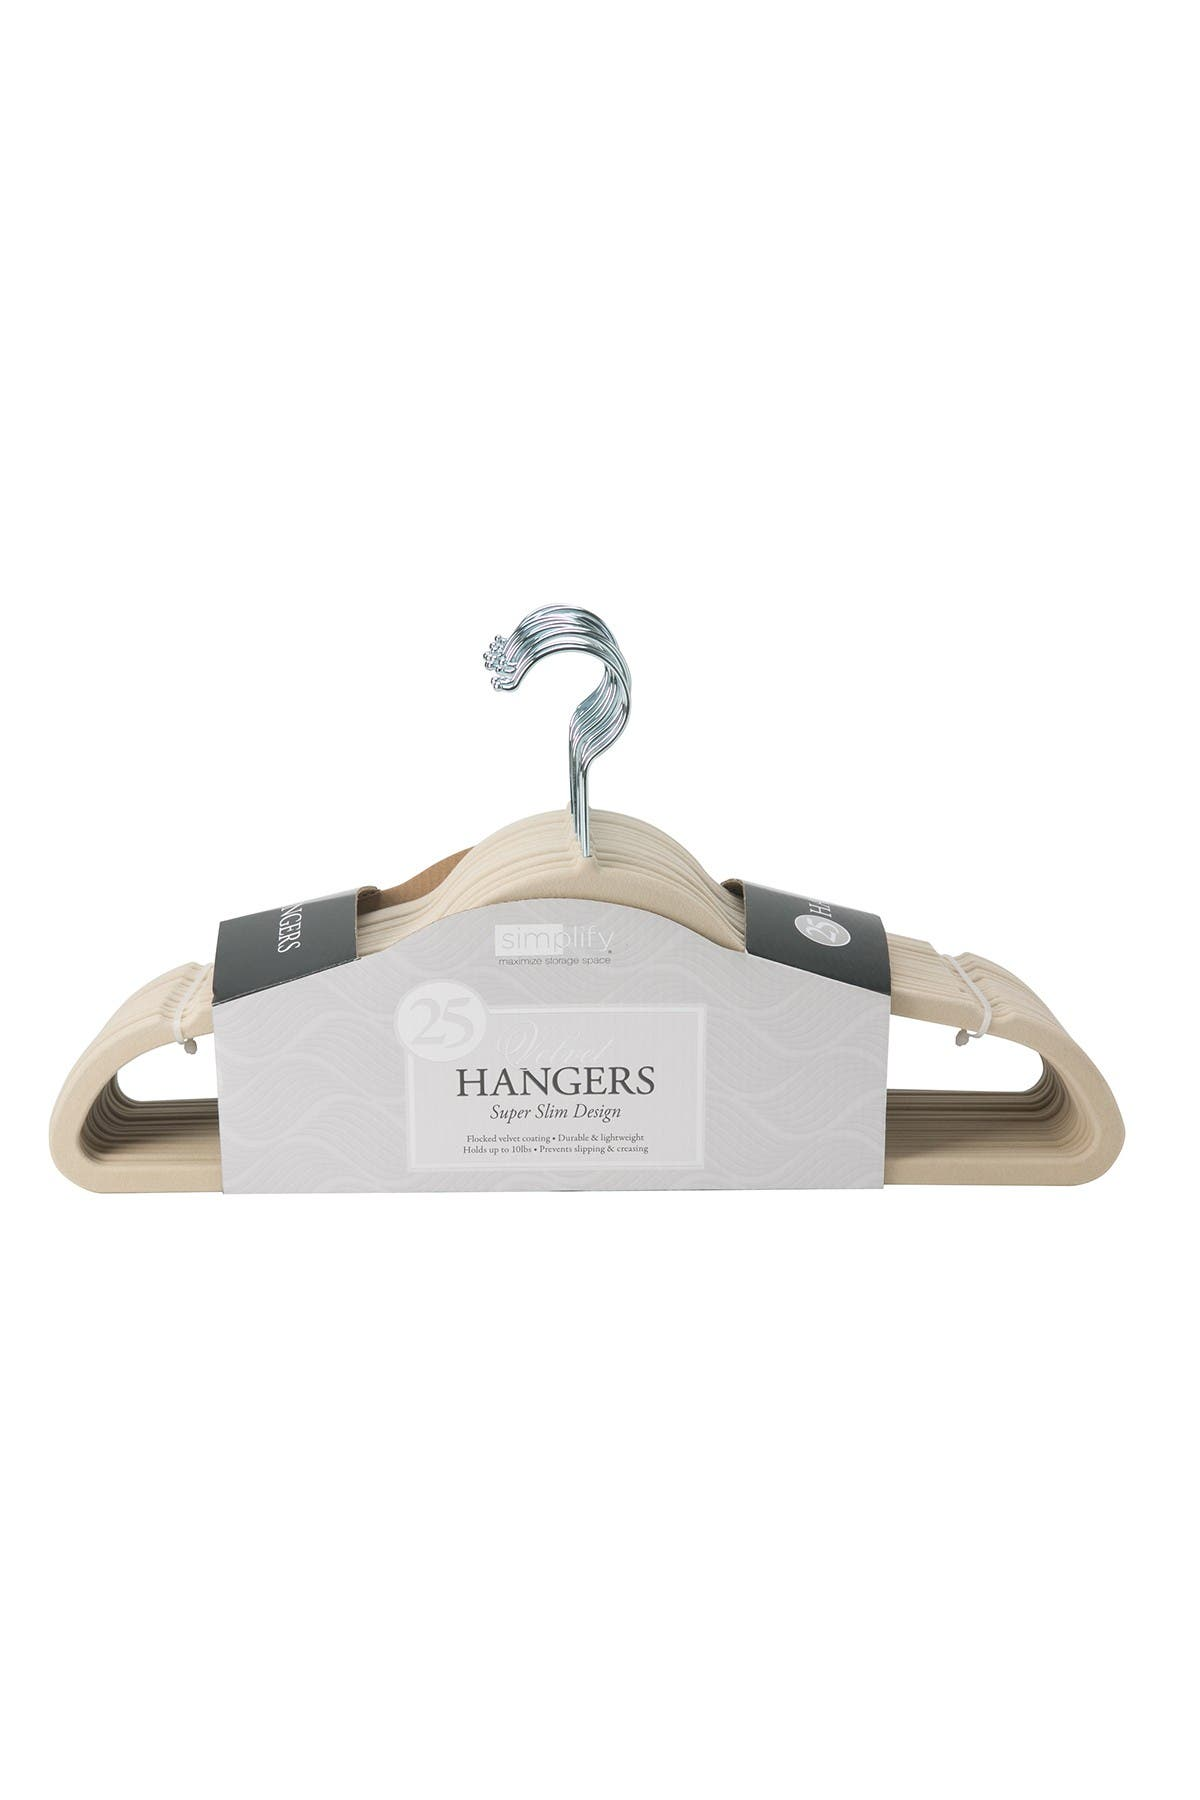 Image of Kennedy International Inc. Ivory Simplify Slim Velvet Suit Hanger - Set of 25